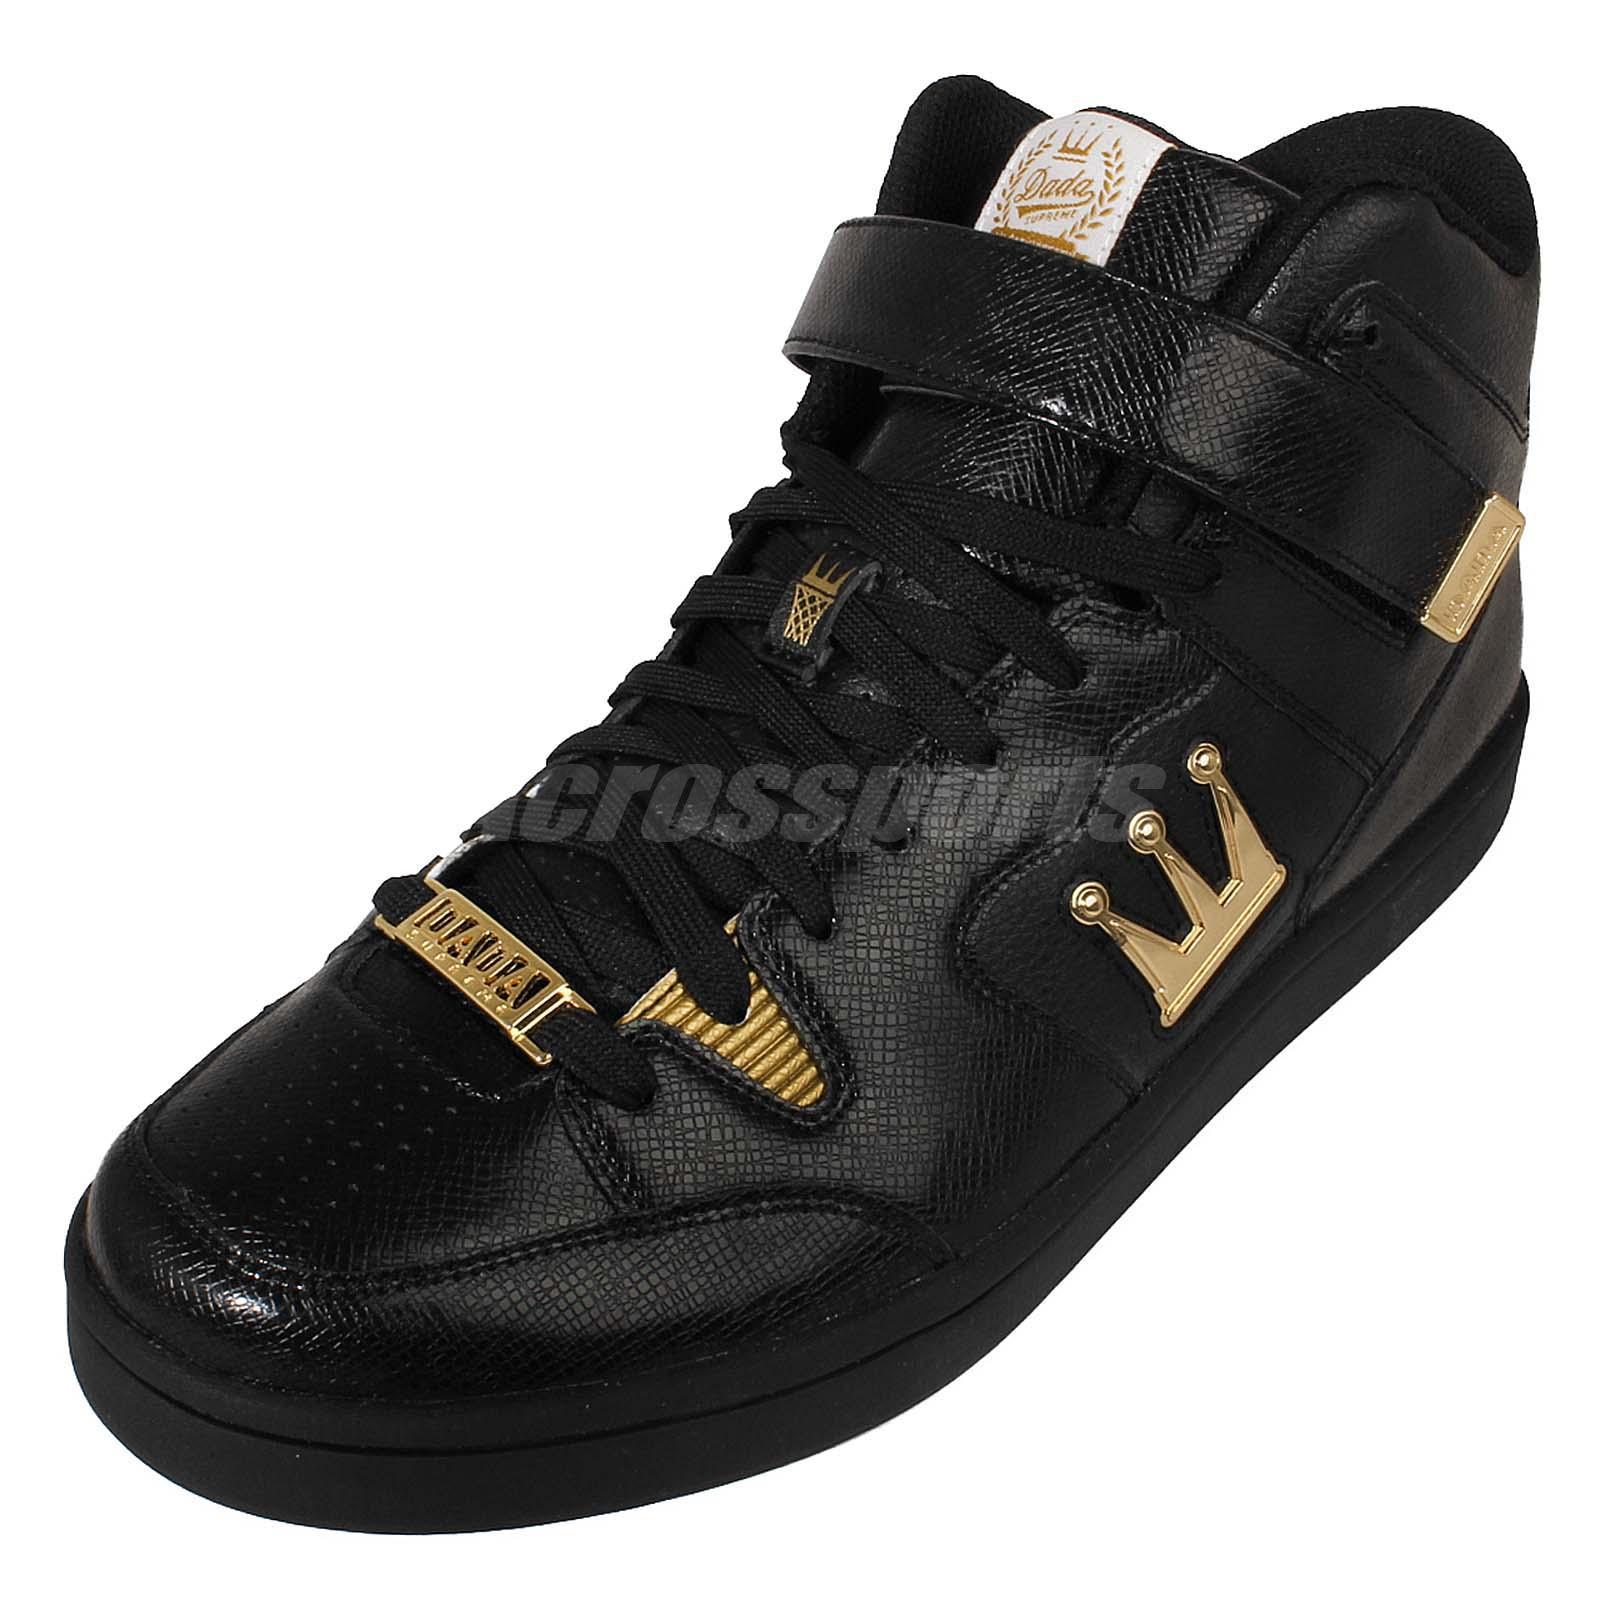 3a203c84dd1 dada supreme shot caller hi black gold logo leather crown mens shoes  sneakers outlet for sale 16ae7 68dc5 - koora-cool.com